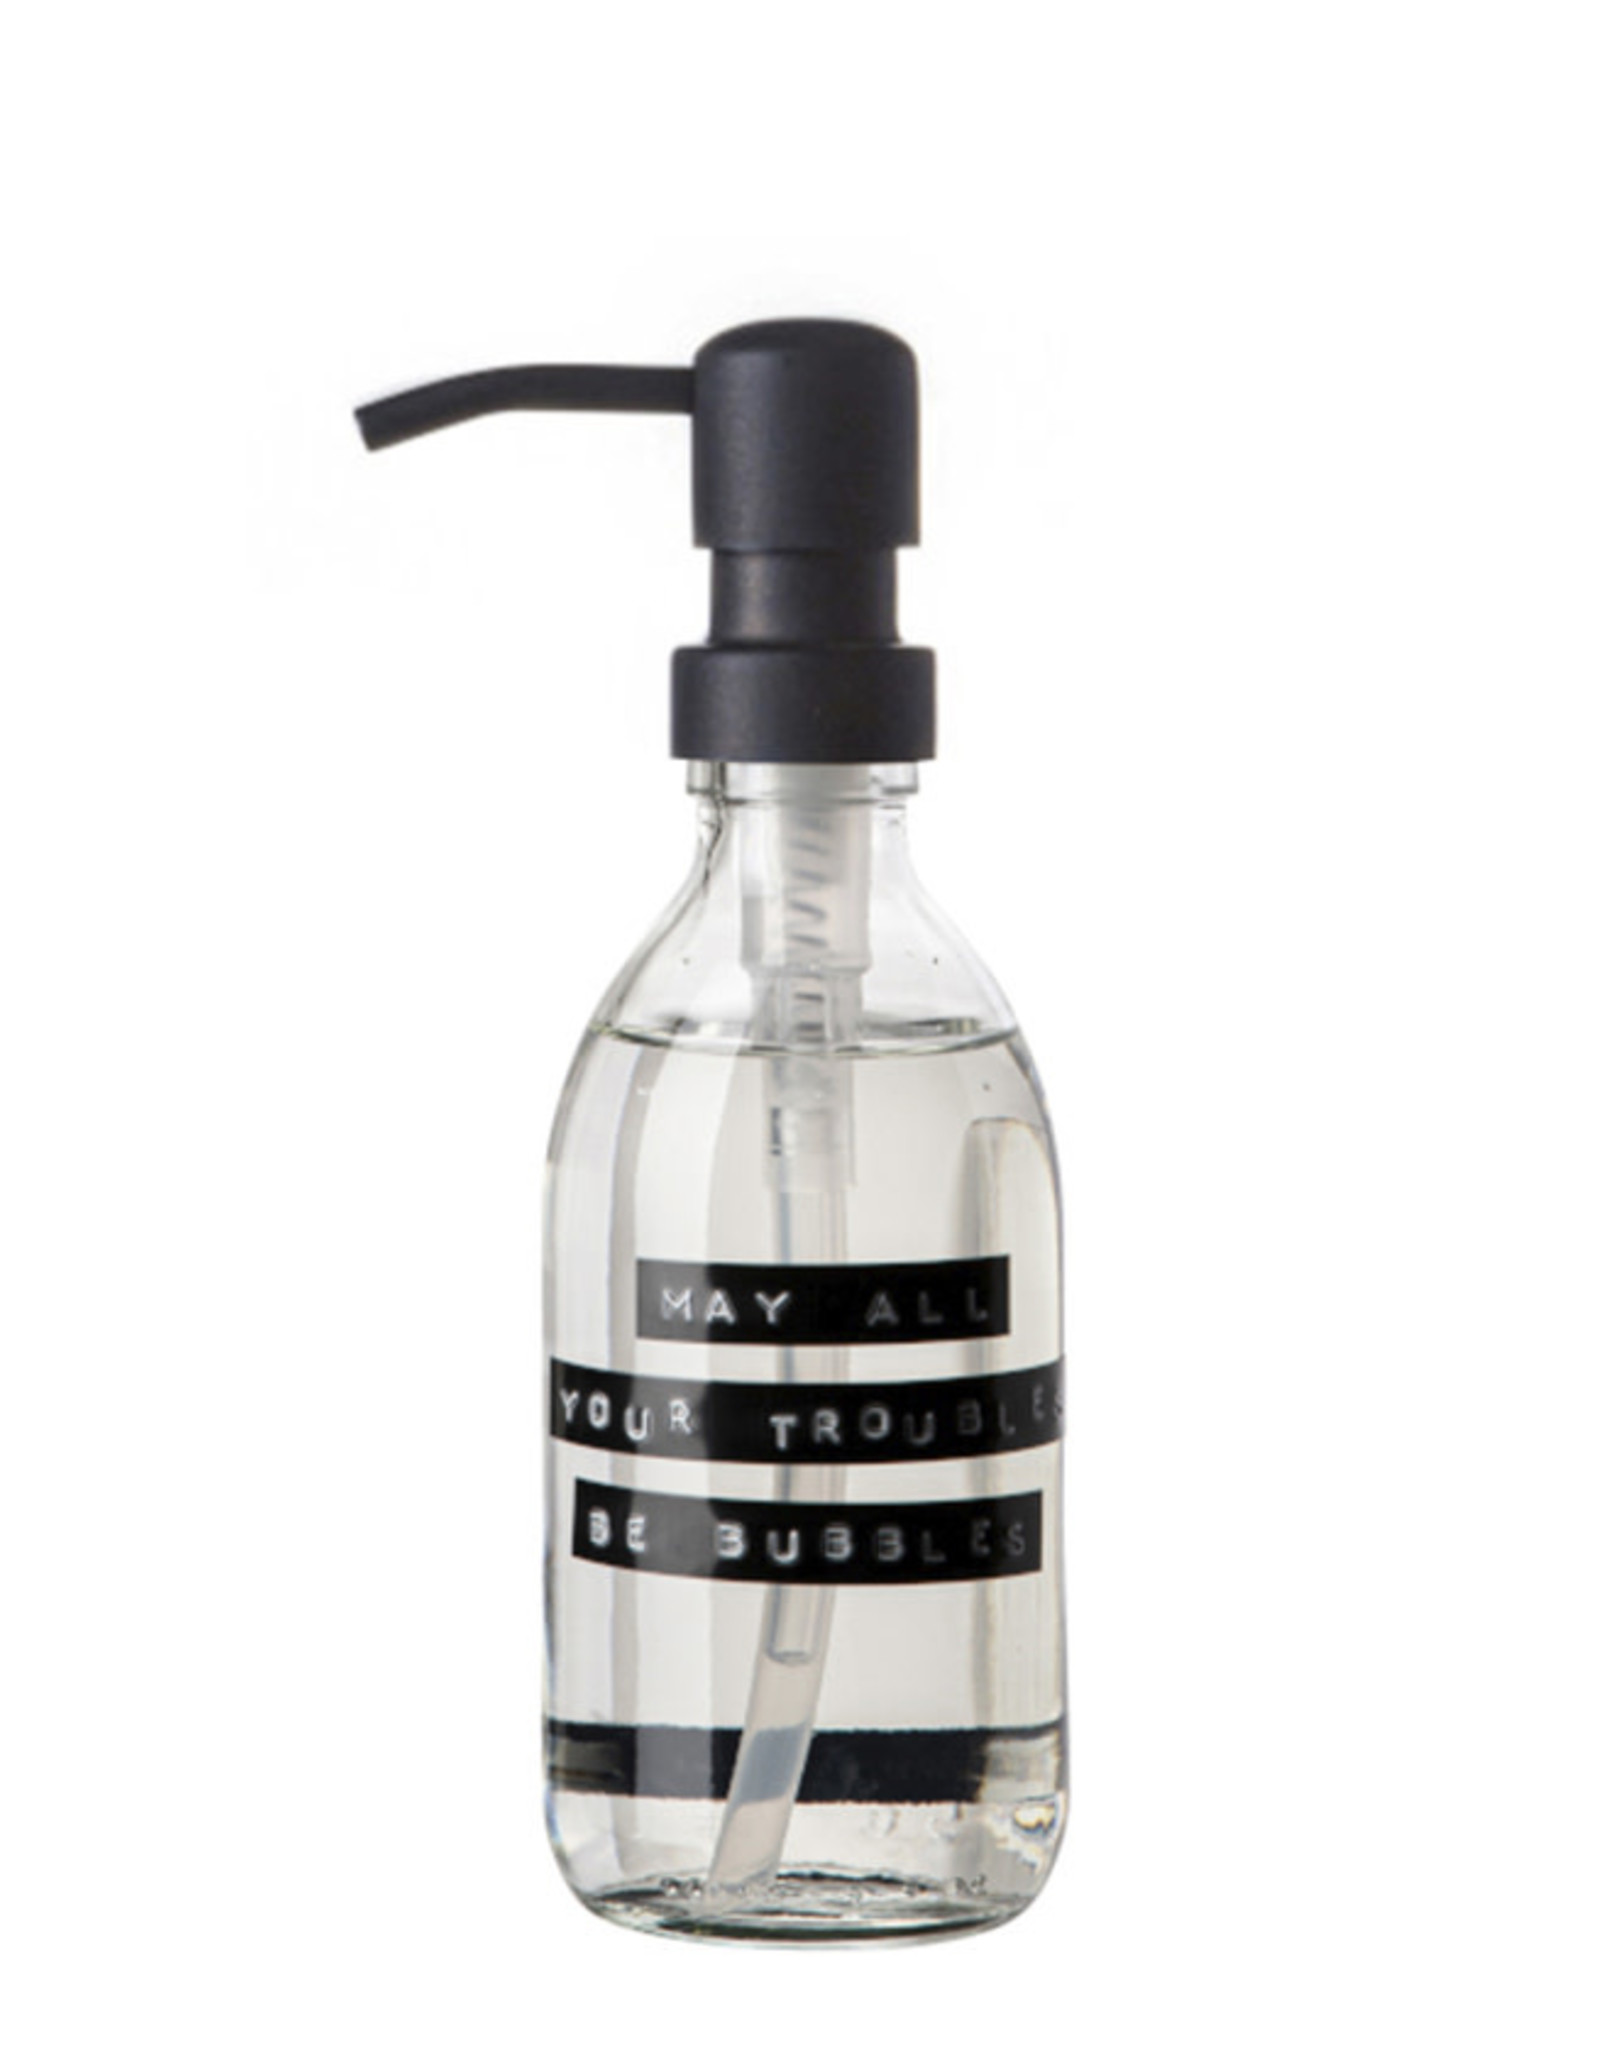 Wellmark Handzeep helder glas /zwarte pomp 250ml-may all your troubles be bubbles